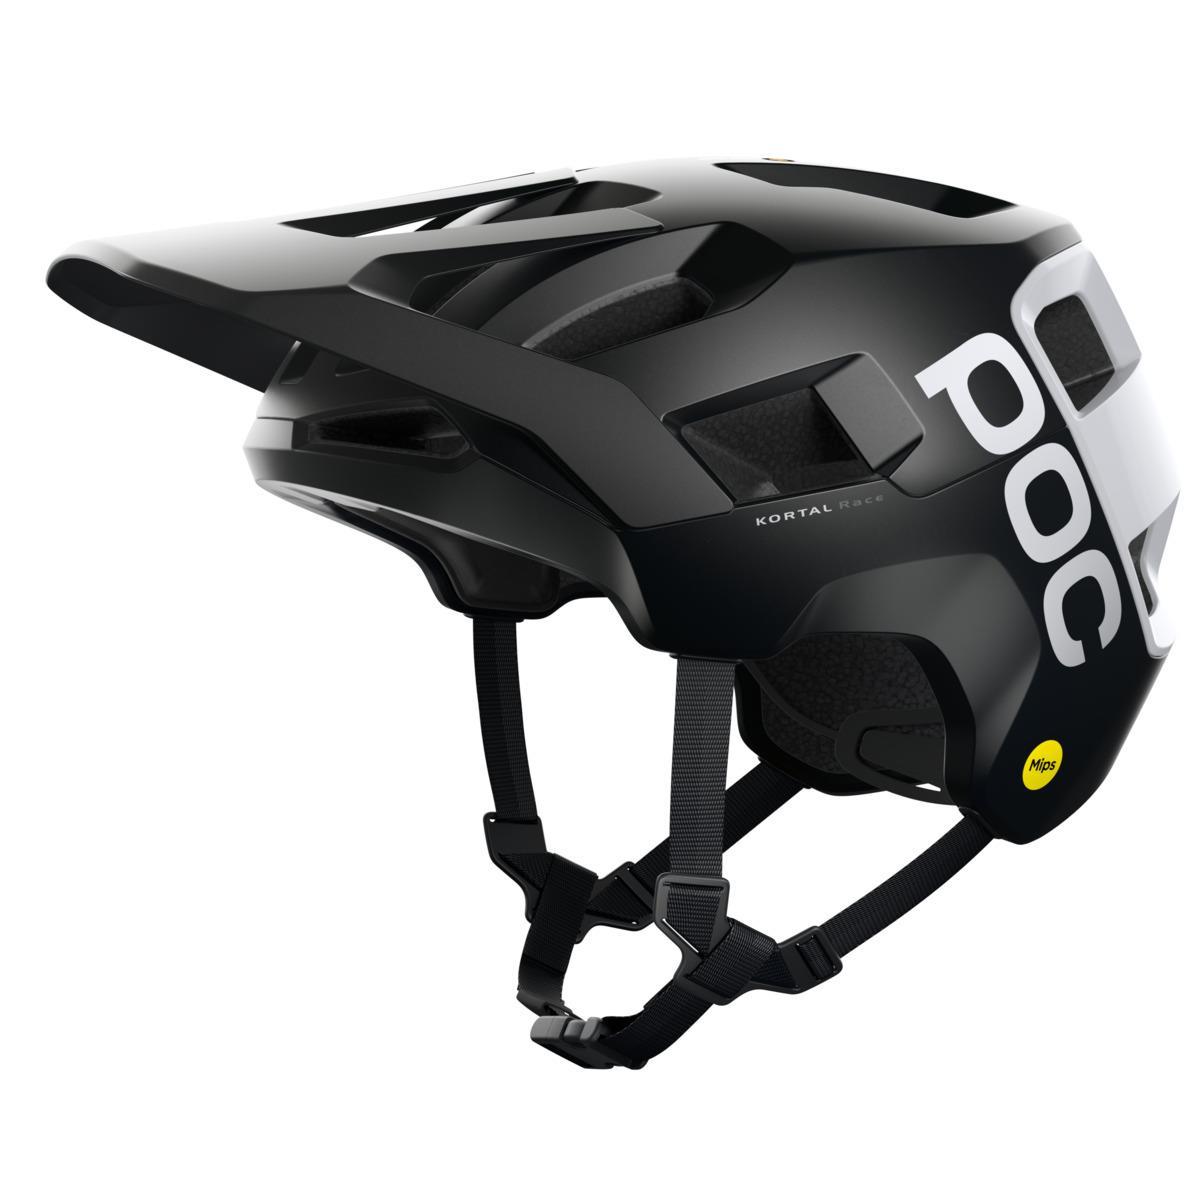 Helmet Kortal Race MIPS Uranium Black size XS-S (51-54)